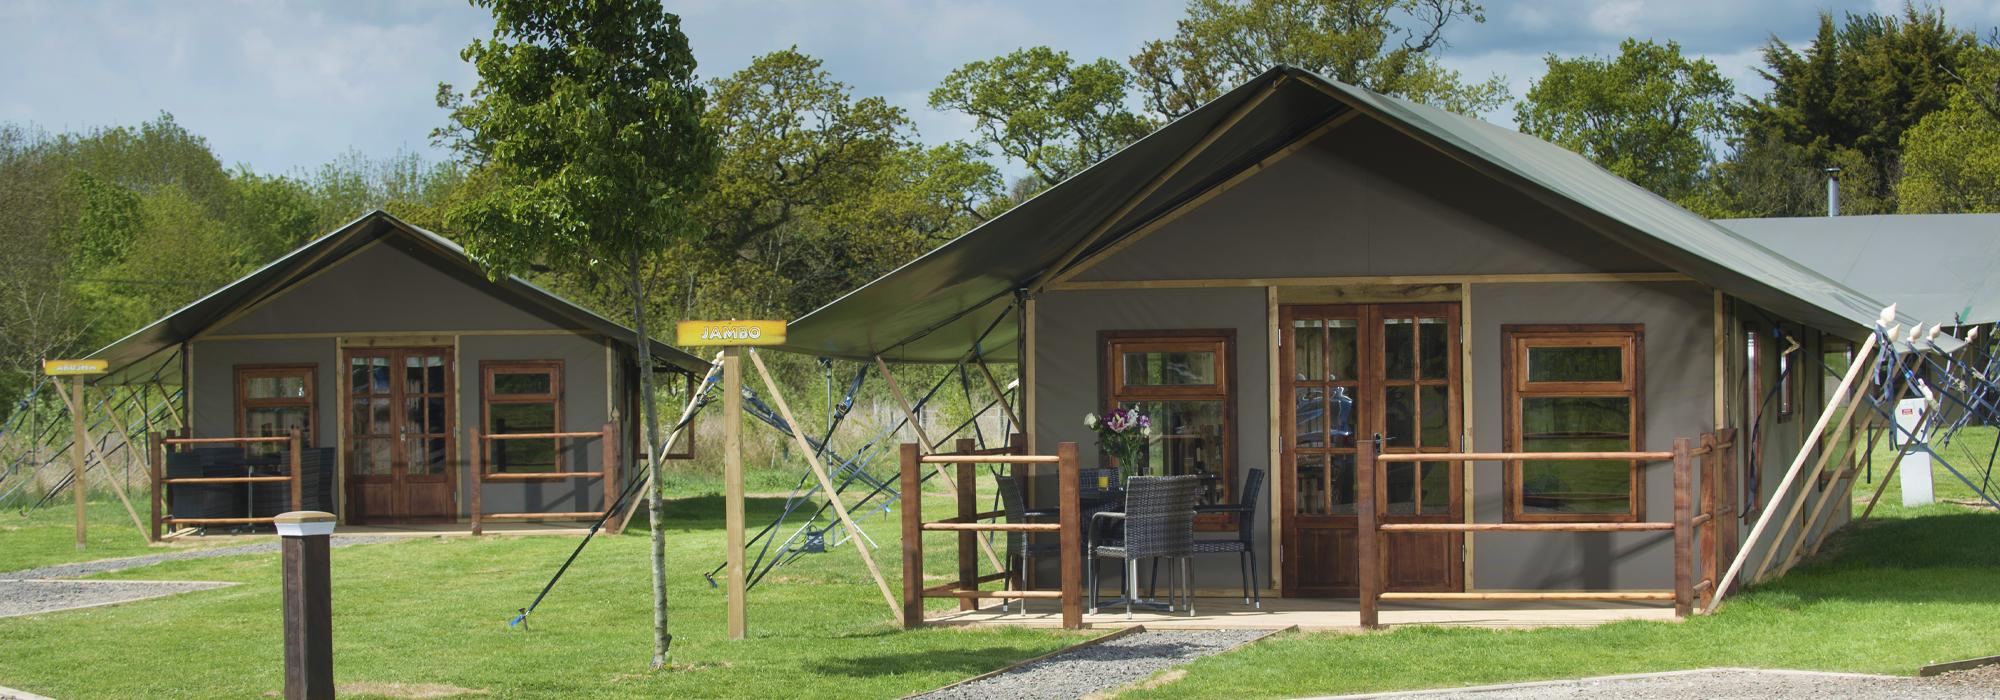 Glamping Tents in Devon